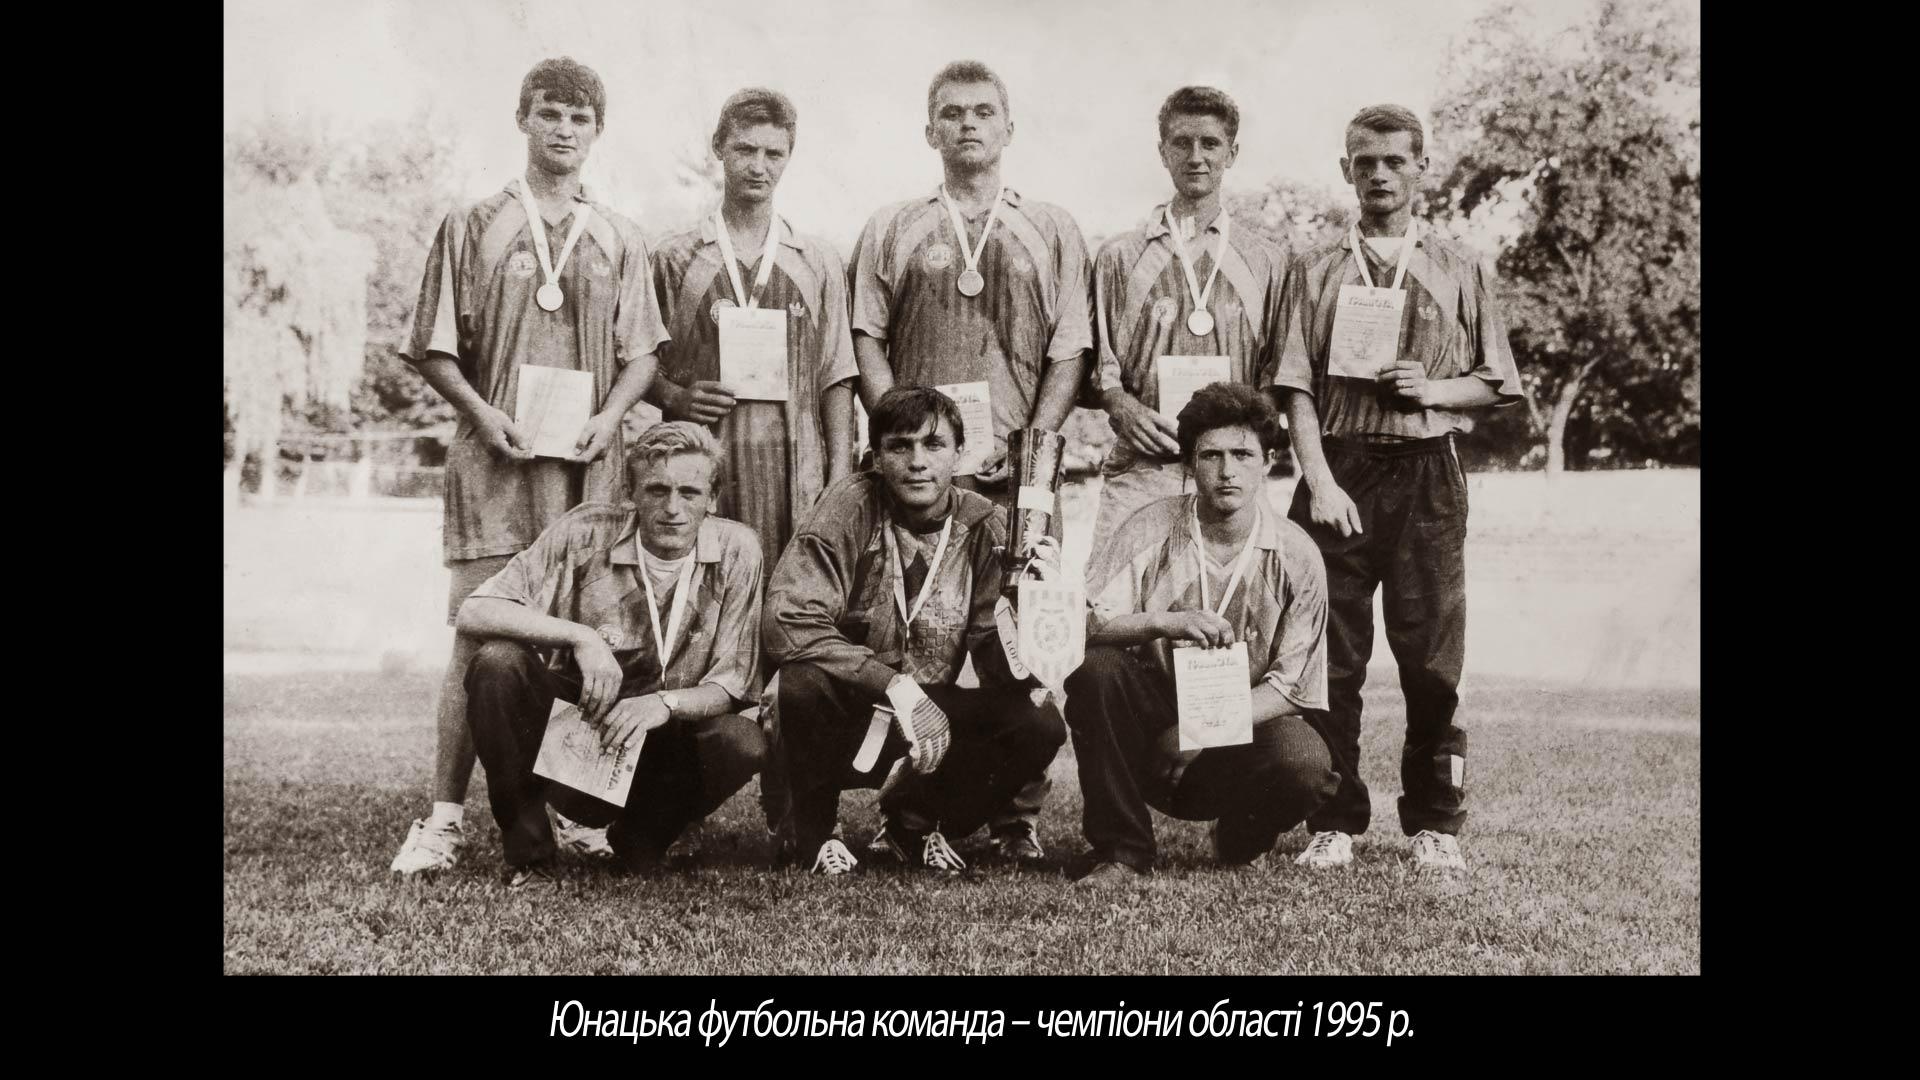 Юнацька футбольна команда – чемпіони області 1995 р.